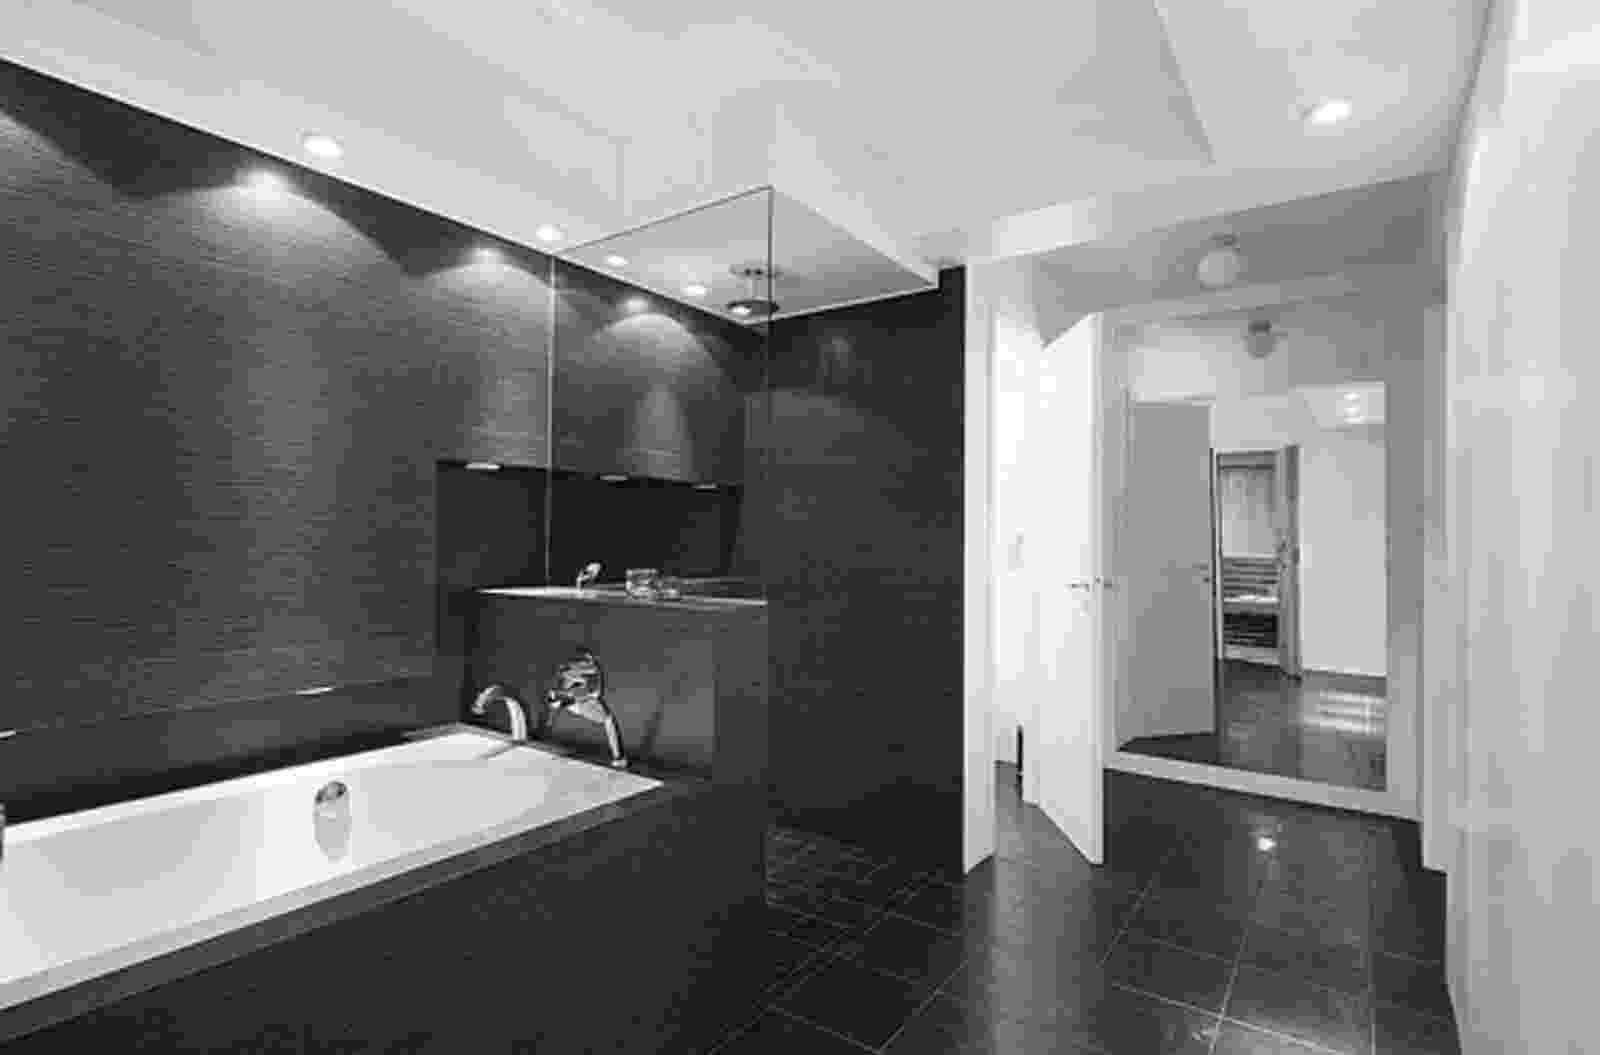 bathroom colours ideas designs 15 space saving tips for modern small bathroom interior designs colours bathroom ideas